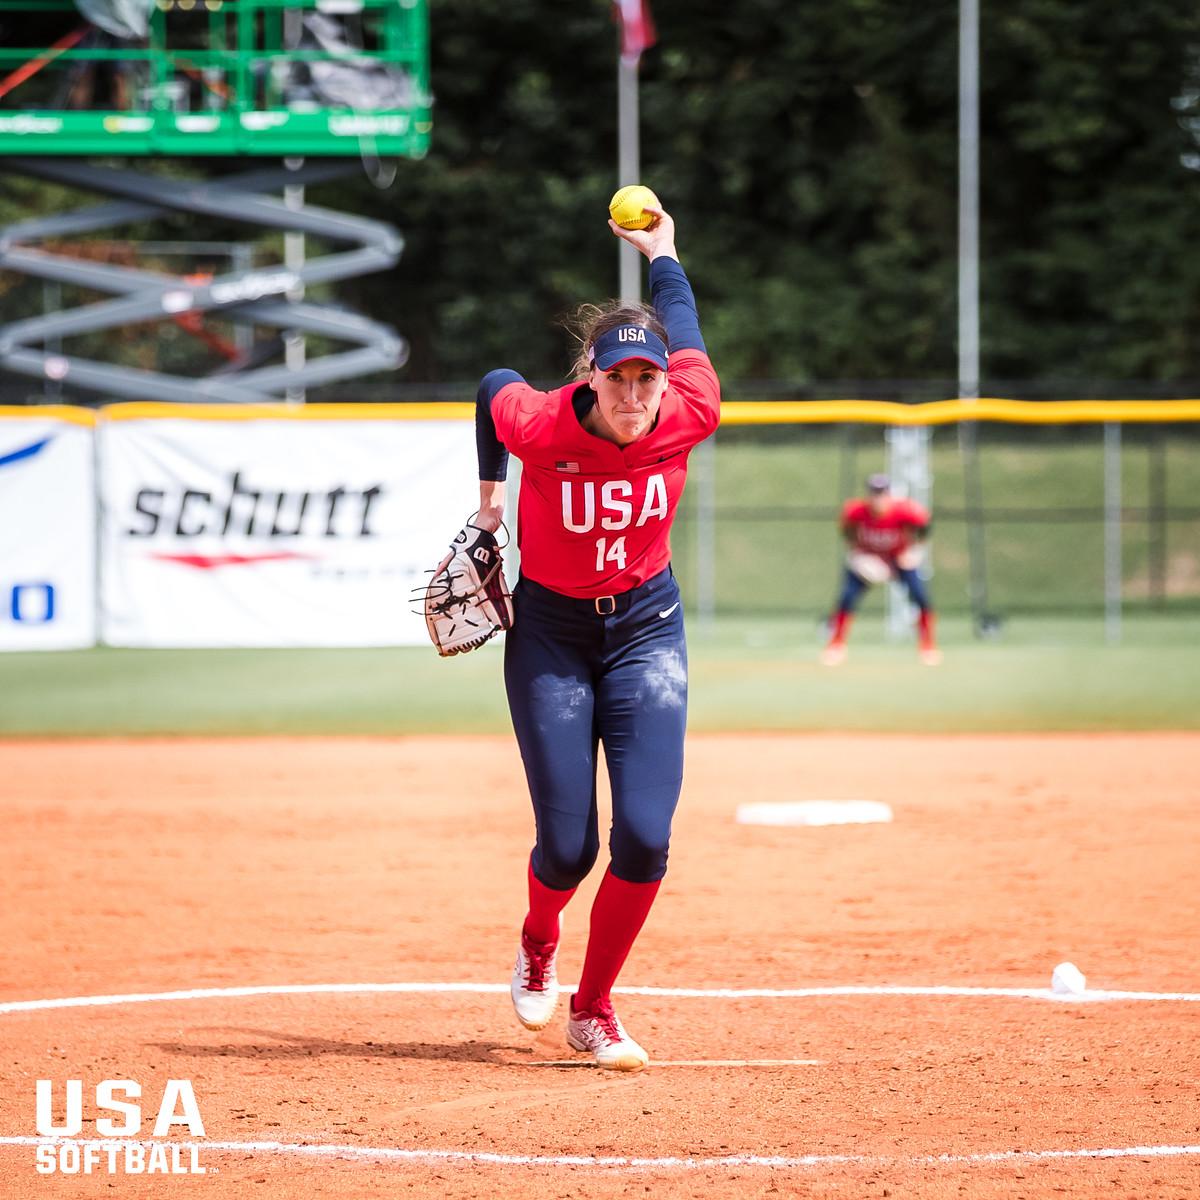 Softball Player Monica Abbott Shares Her Fitness Secrets